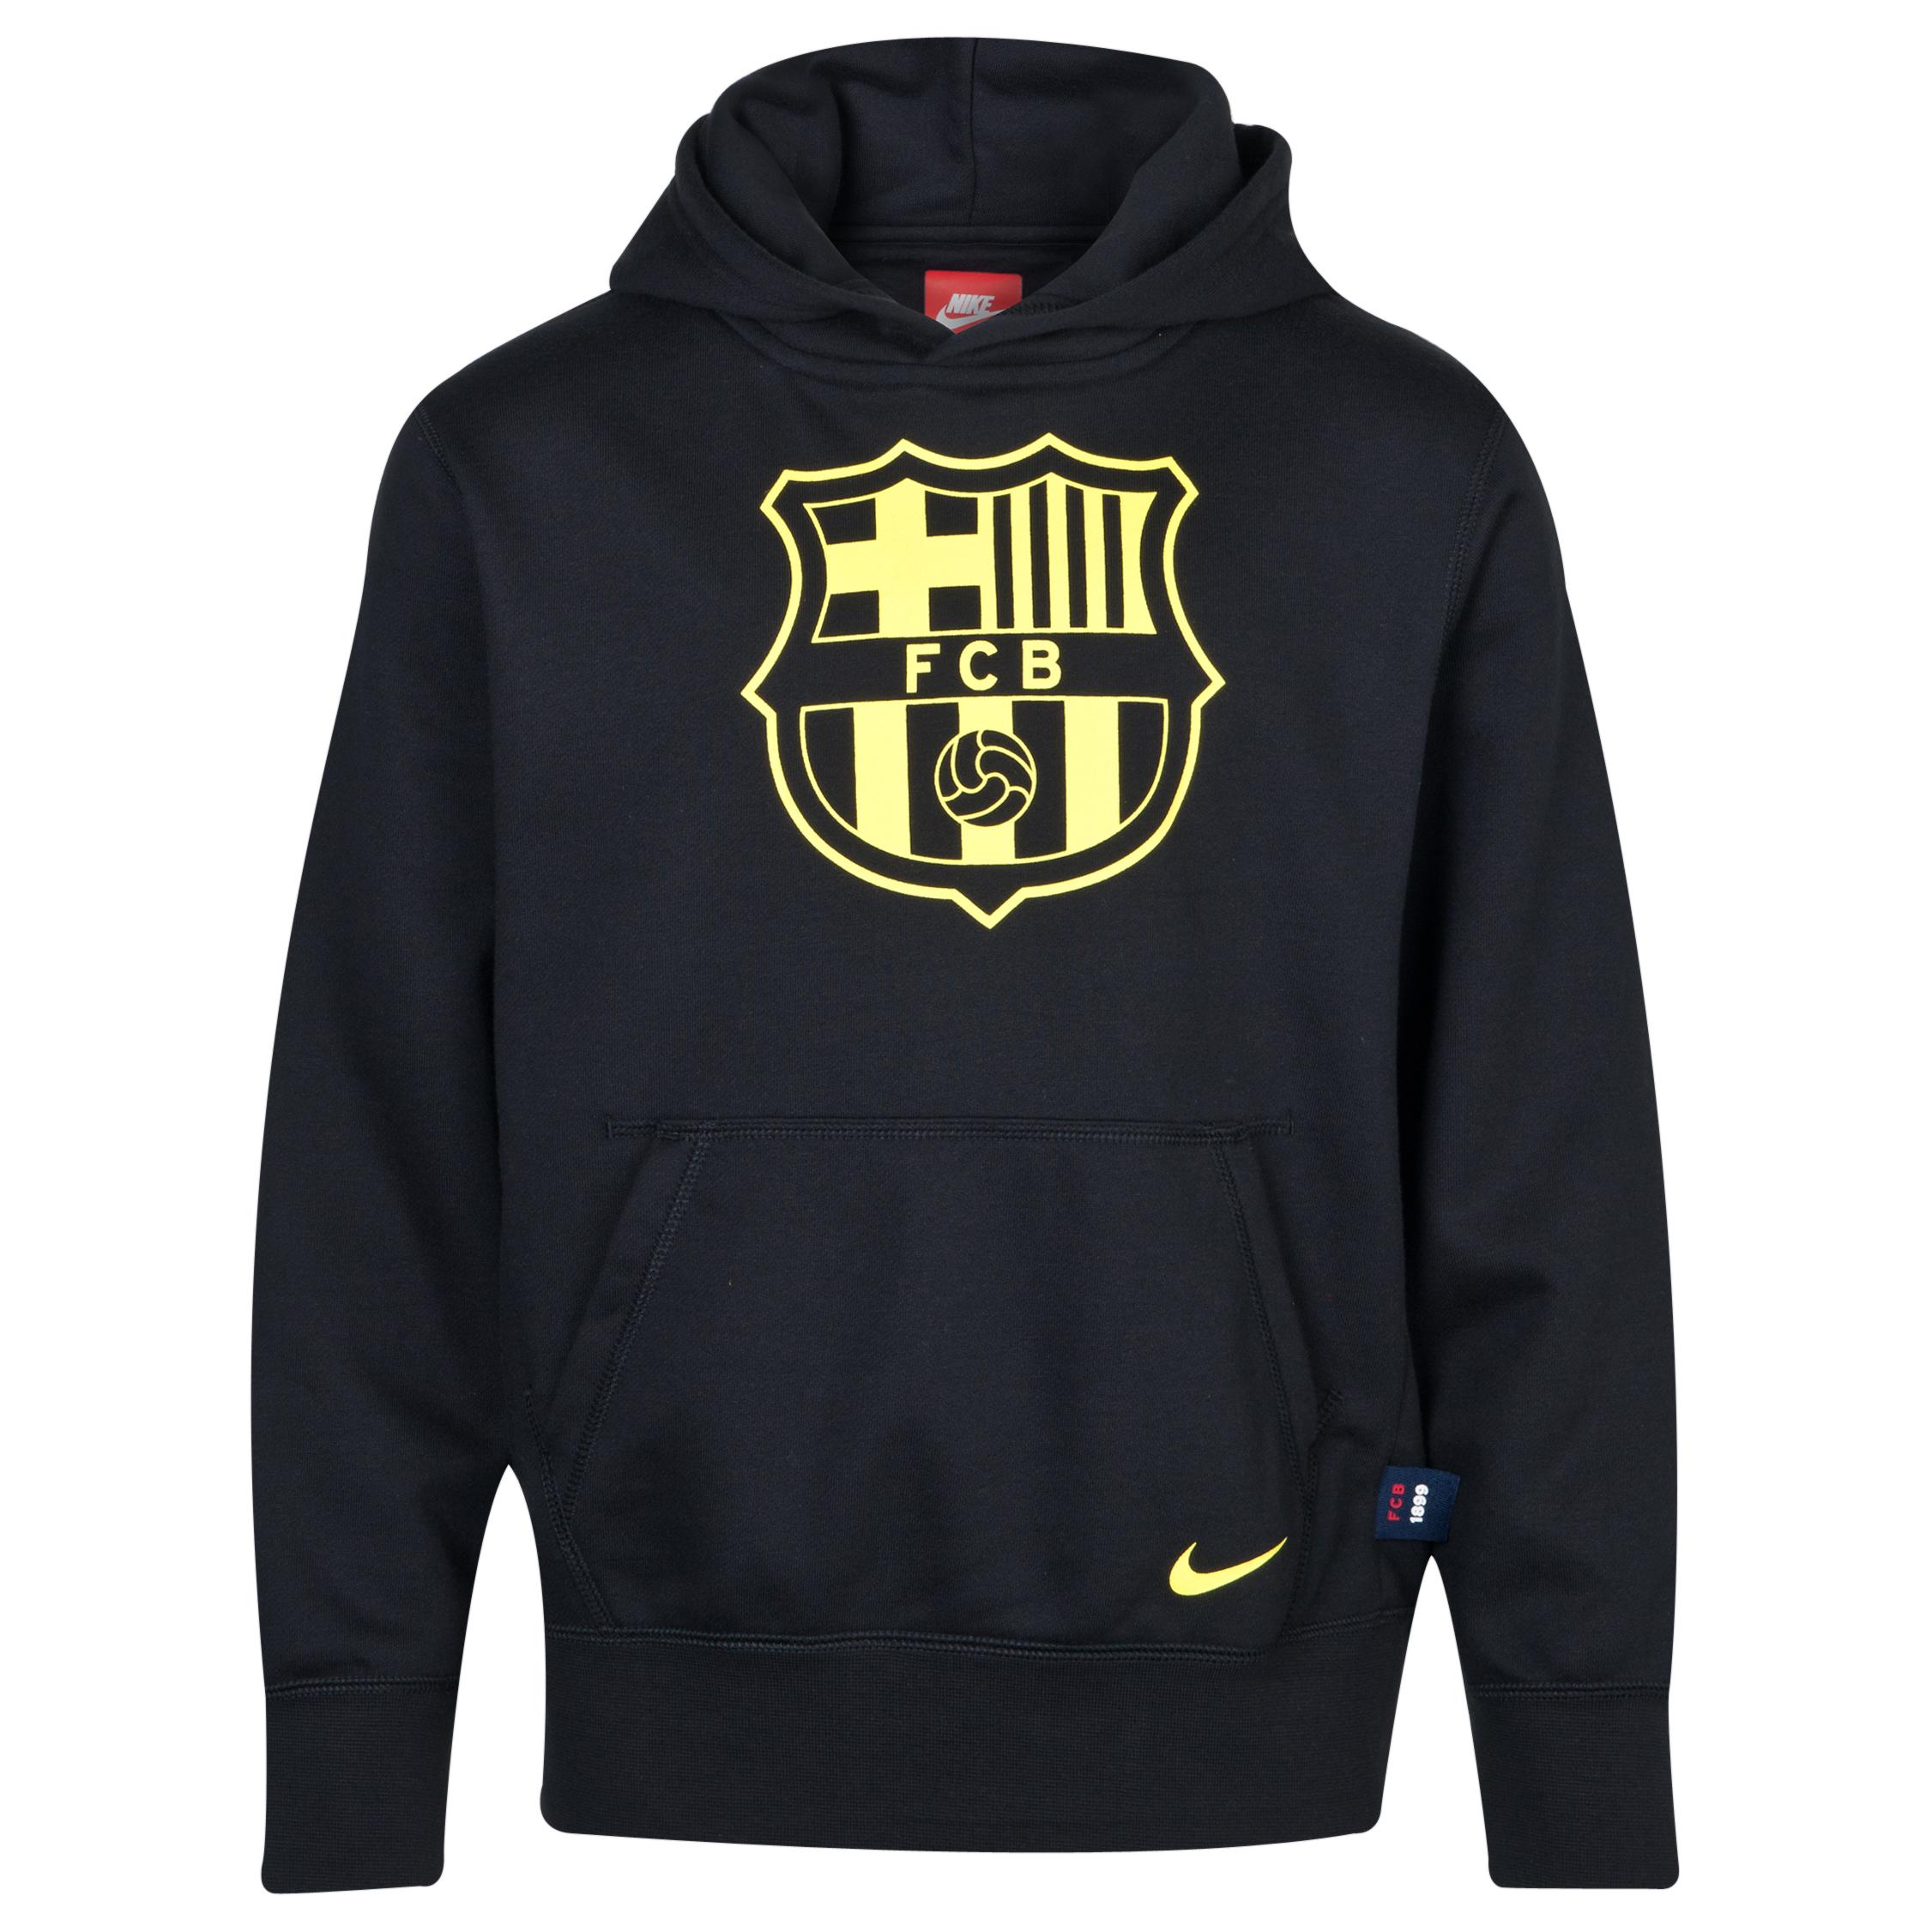 Barcelona OTH Hoody - Black/Vibrant Yellow - Kids Black